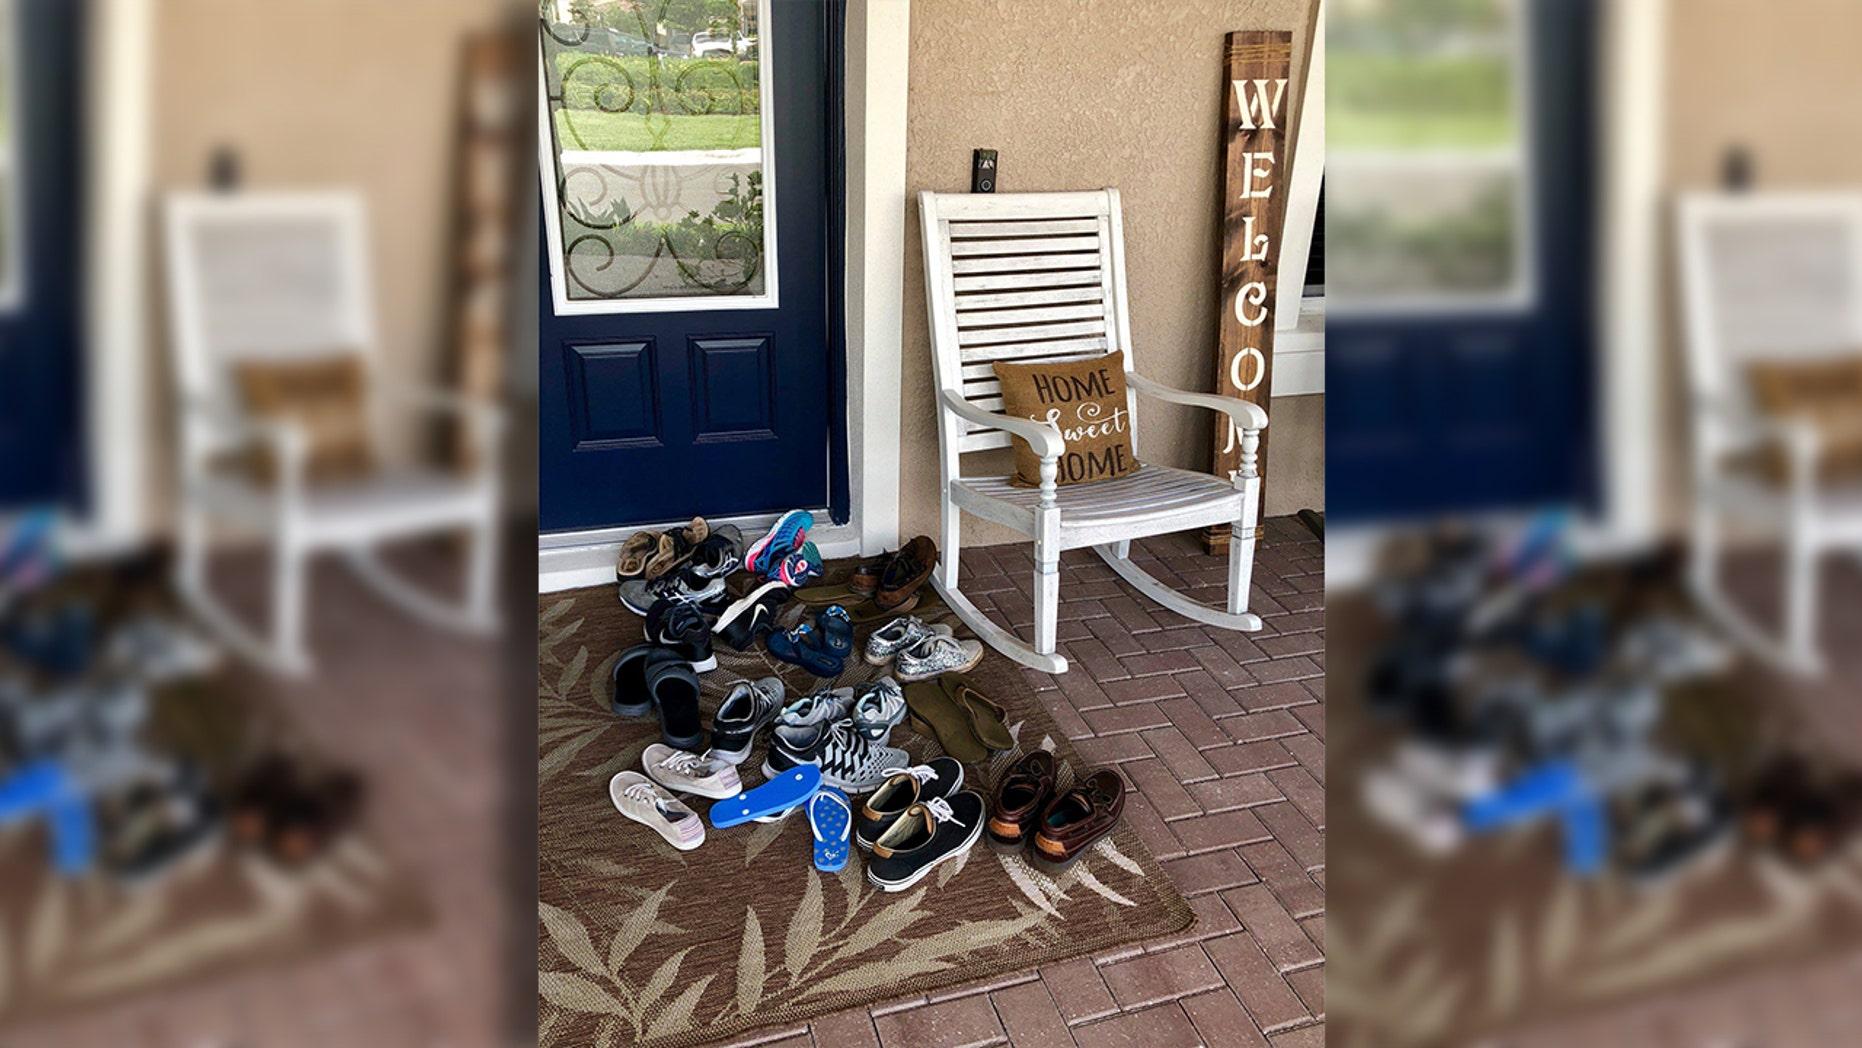 One Florida mom's sentimental Facebook post has gone viral.